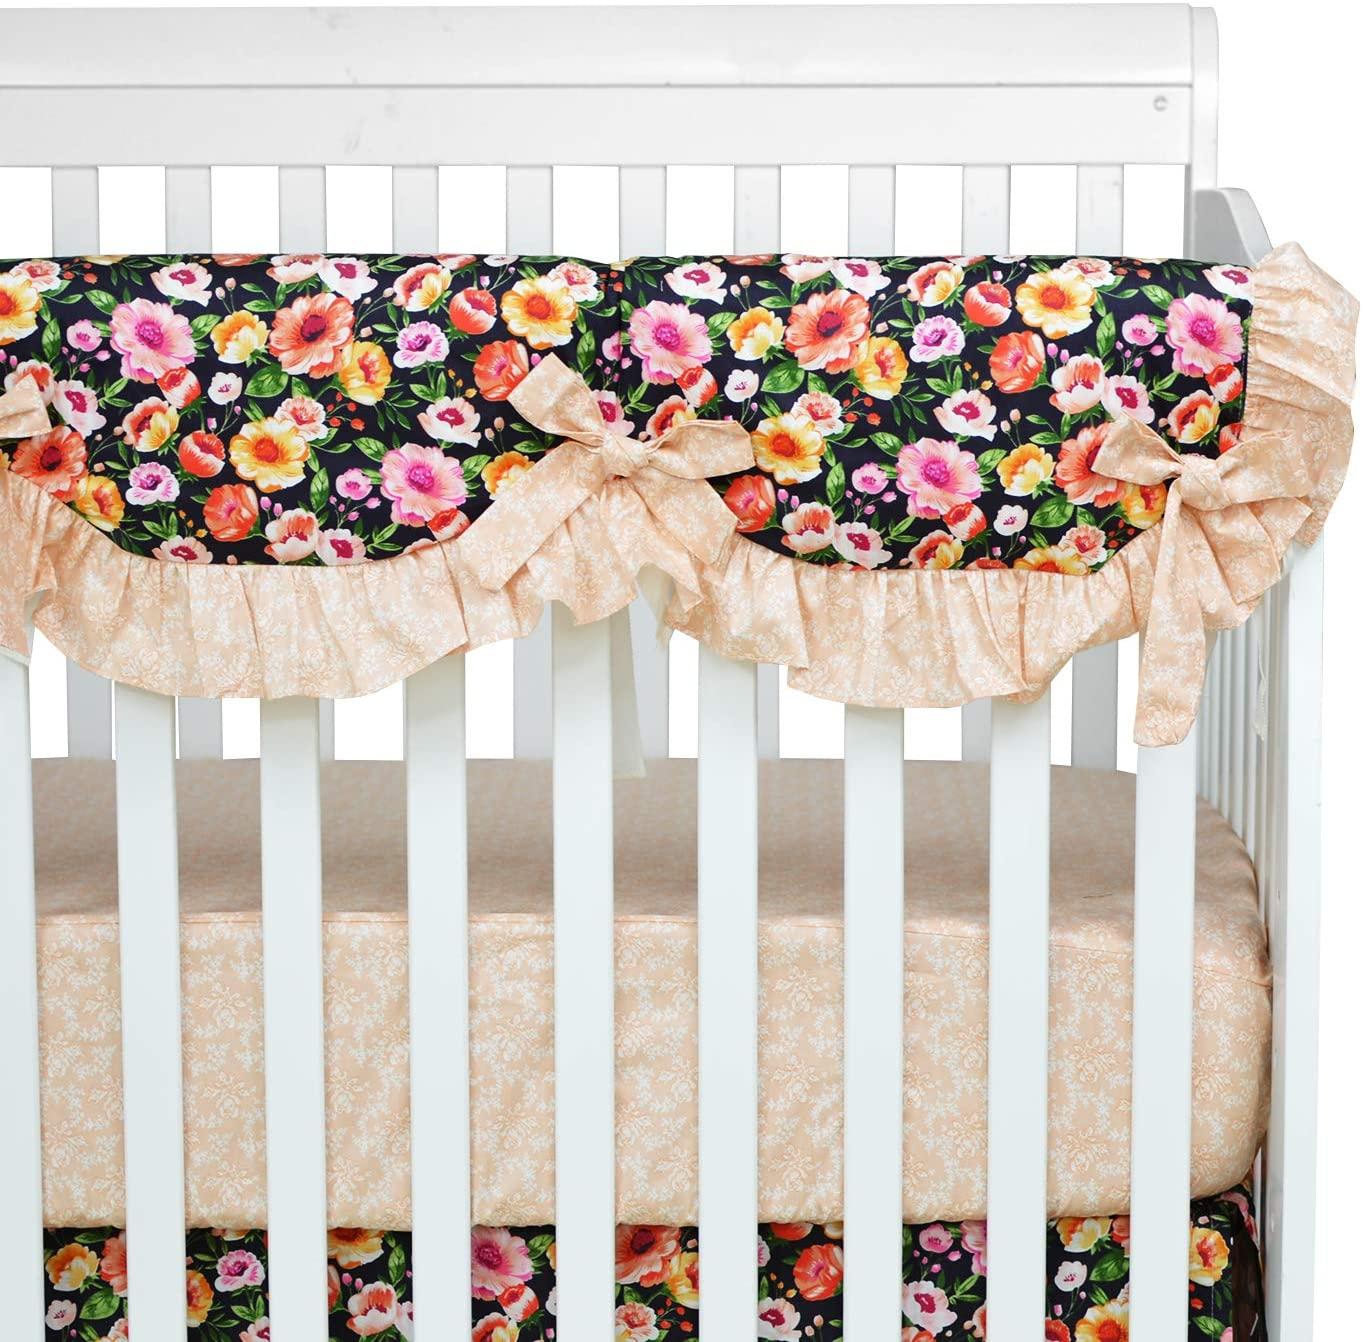 Brandream Baby Girls Vintage Crib Rail Cover Farmhouse Floral Baby Teething Guard Charming Boho Protector Guard Sweet Long Front Crib Rail Guard, Garden Blush Pink Floral